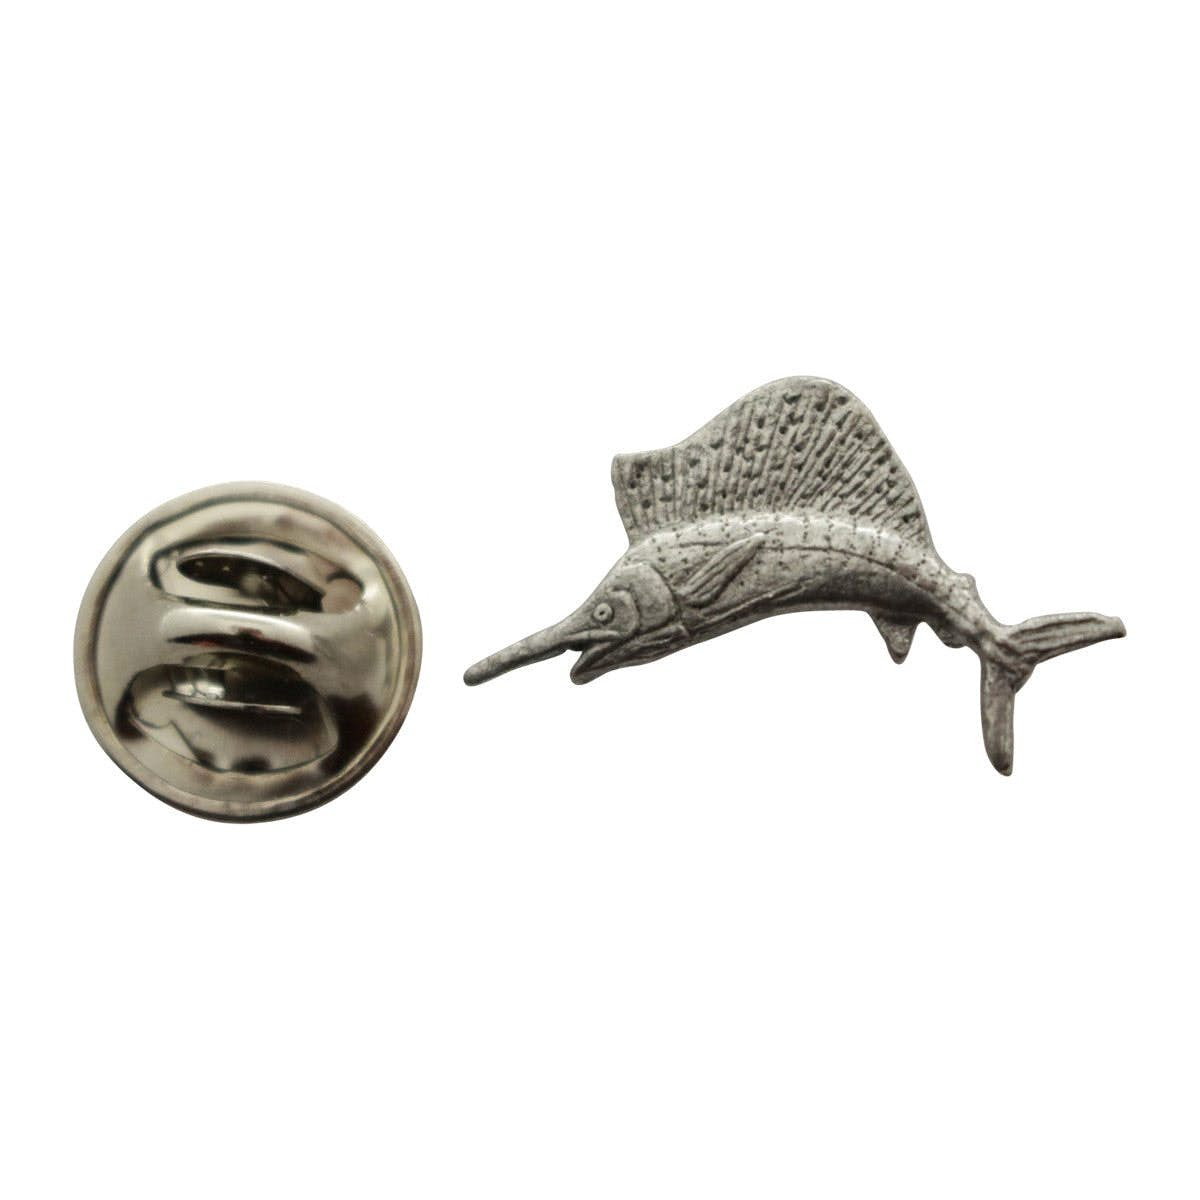 Sailfish Mini Pin ~ Antiqued Pewter ~ Miniature Lapel Pin ~ Sarahu0027s Treats  U0026 Treasures